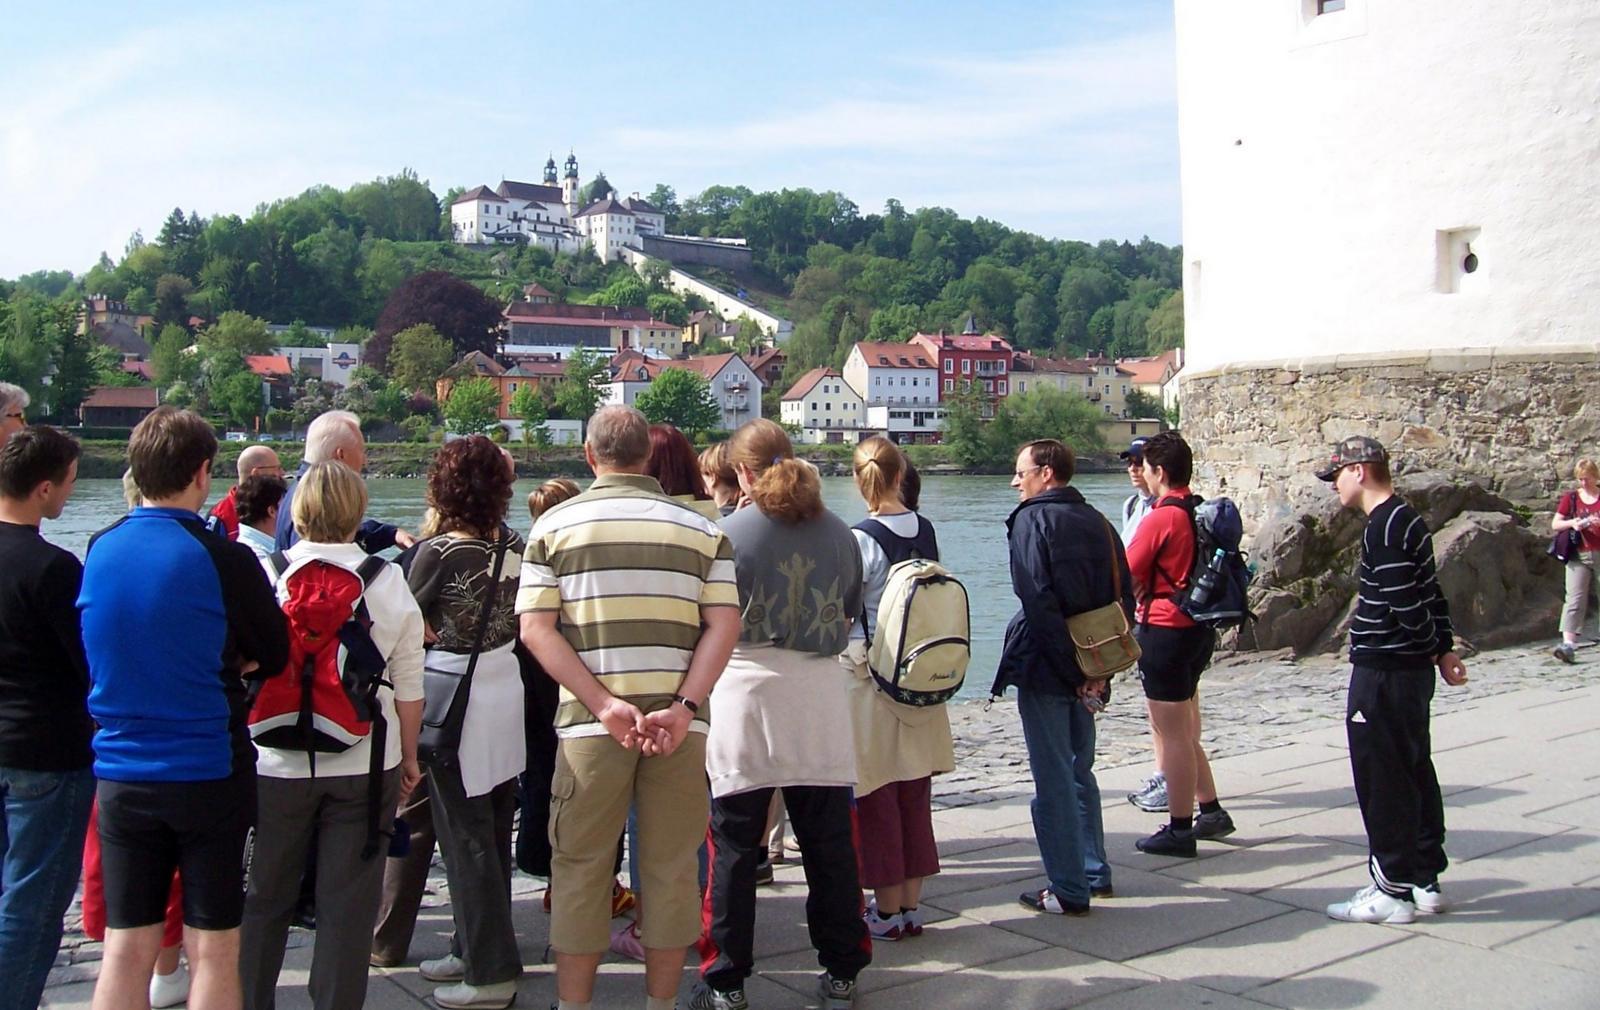 Blick auf Mariahilf in Passau